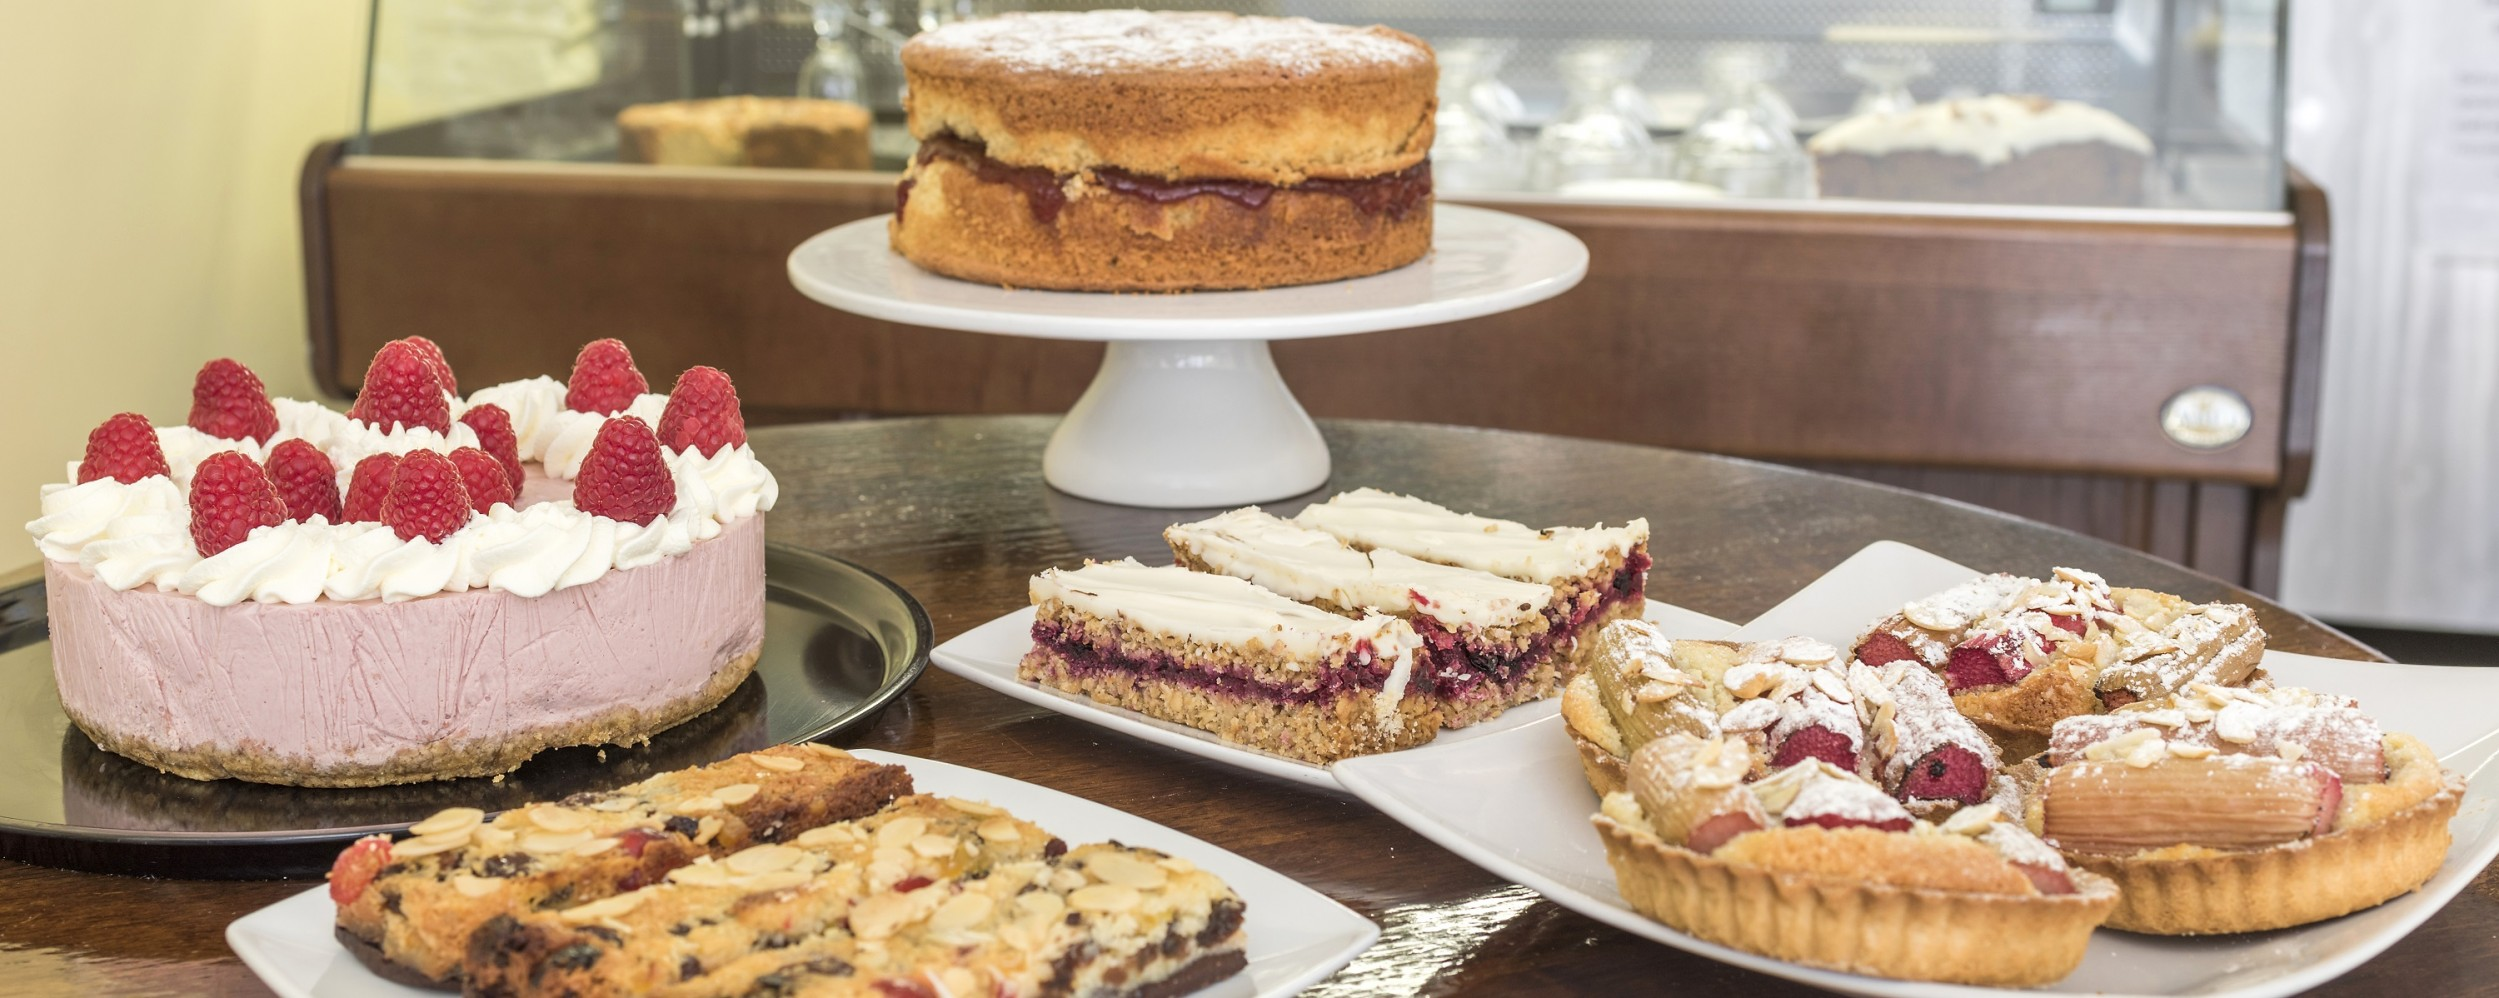 Celebration Cakes Kaf Fontana Coffee Shop And Cafe In Sherborne